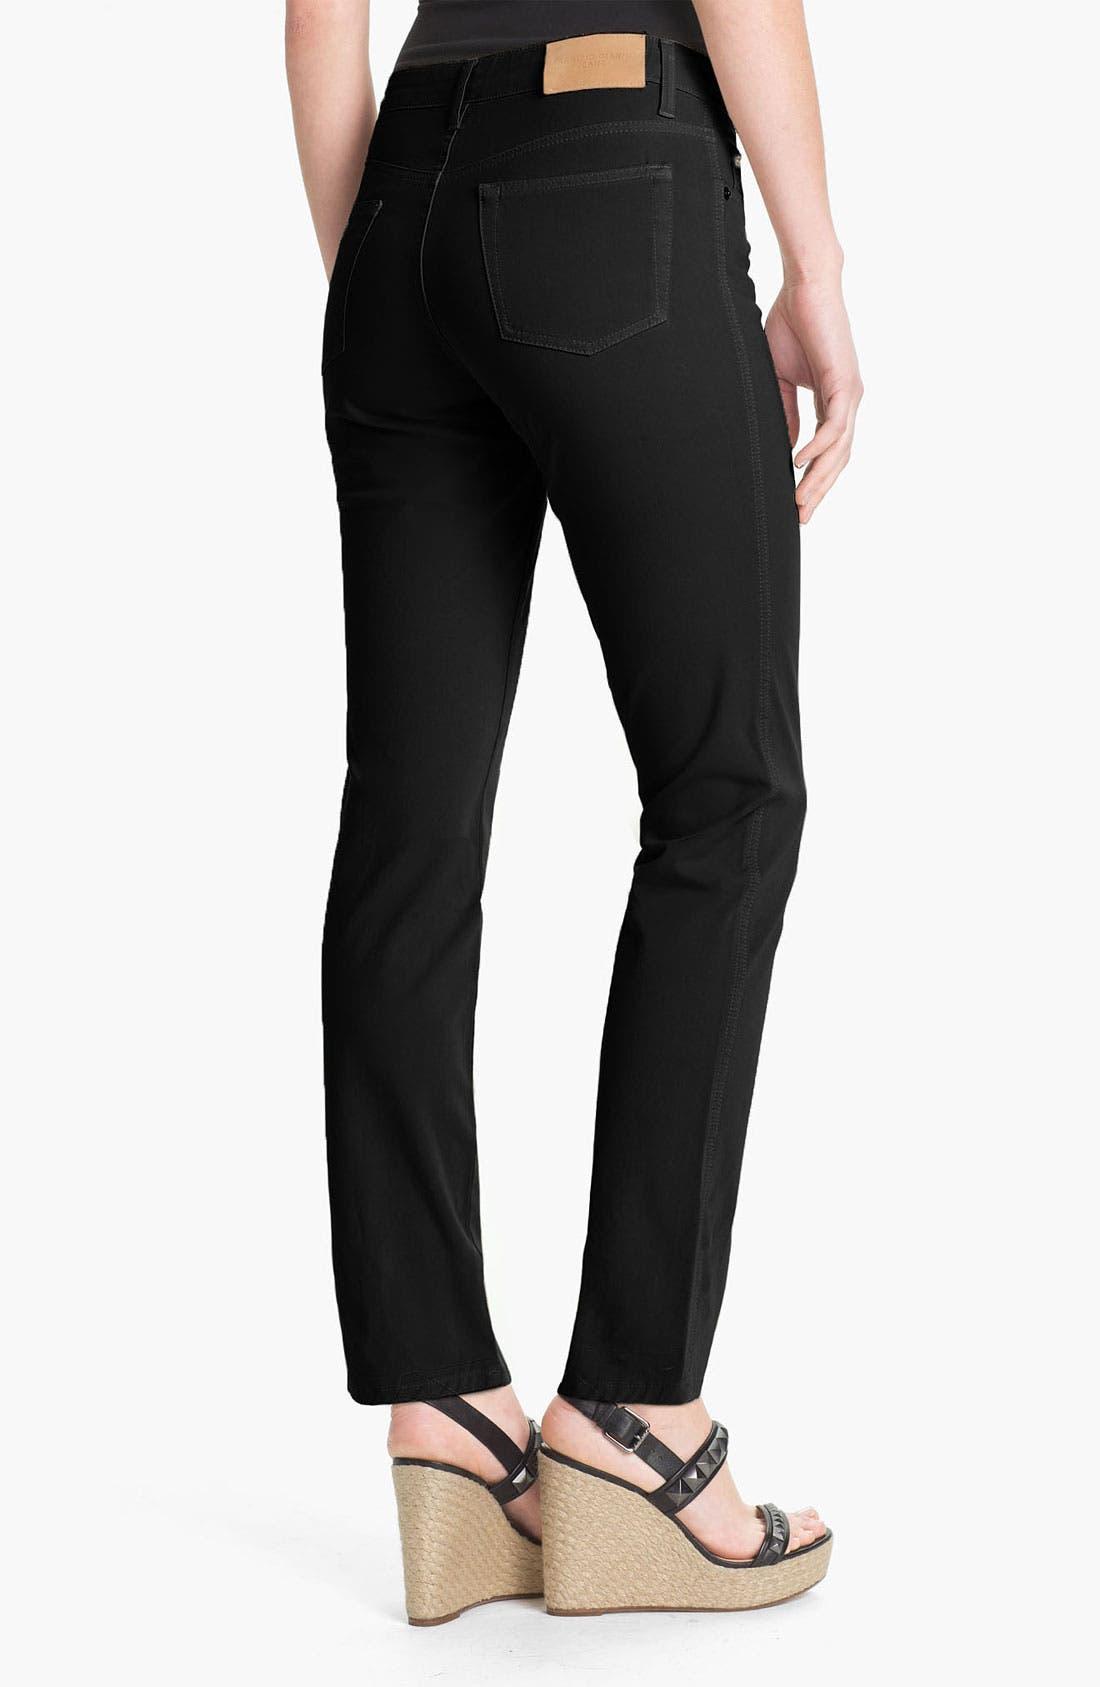 FABRIZIO GIANNI,                             5-Pocket Slim Stretch Jeans,                             Alternate thumbnail 3, color,                             001